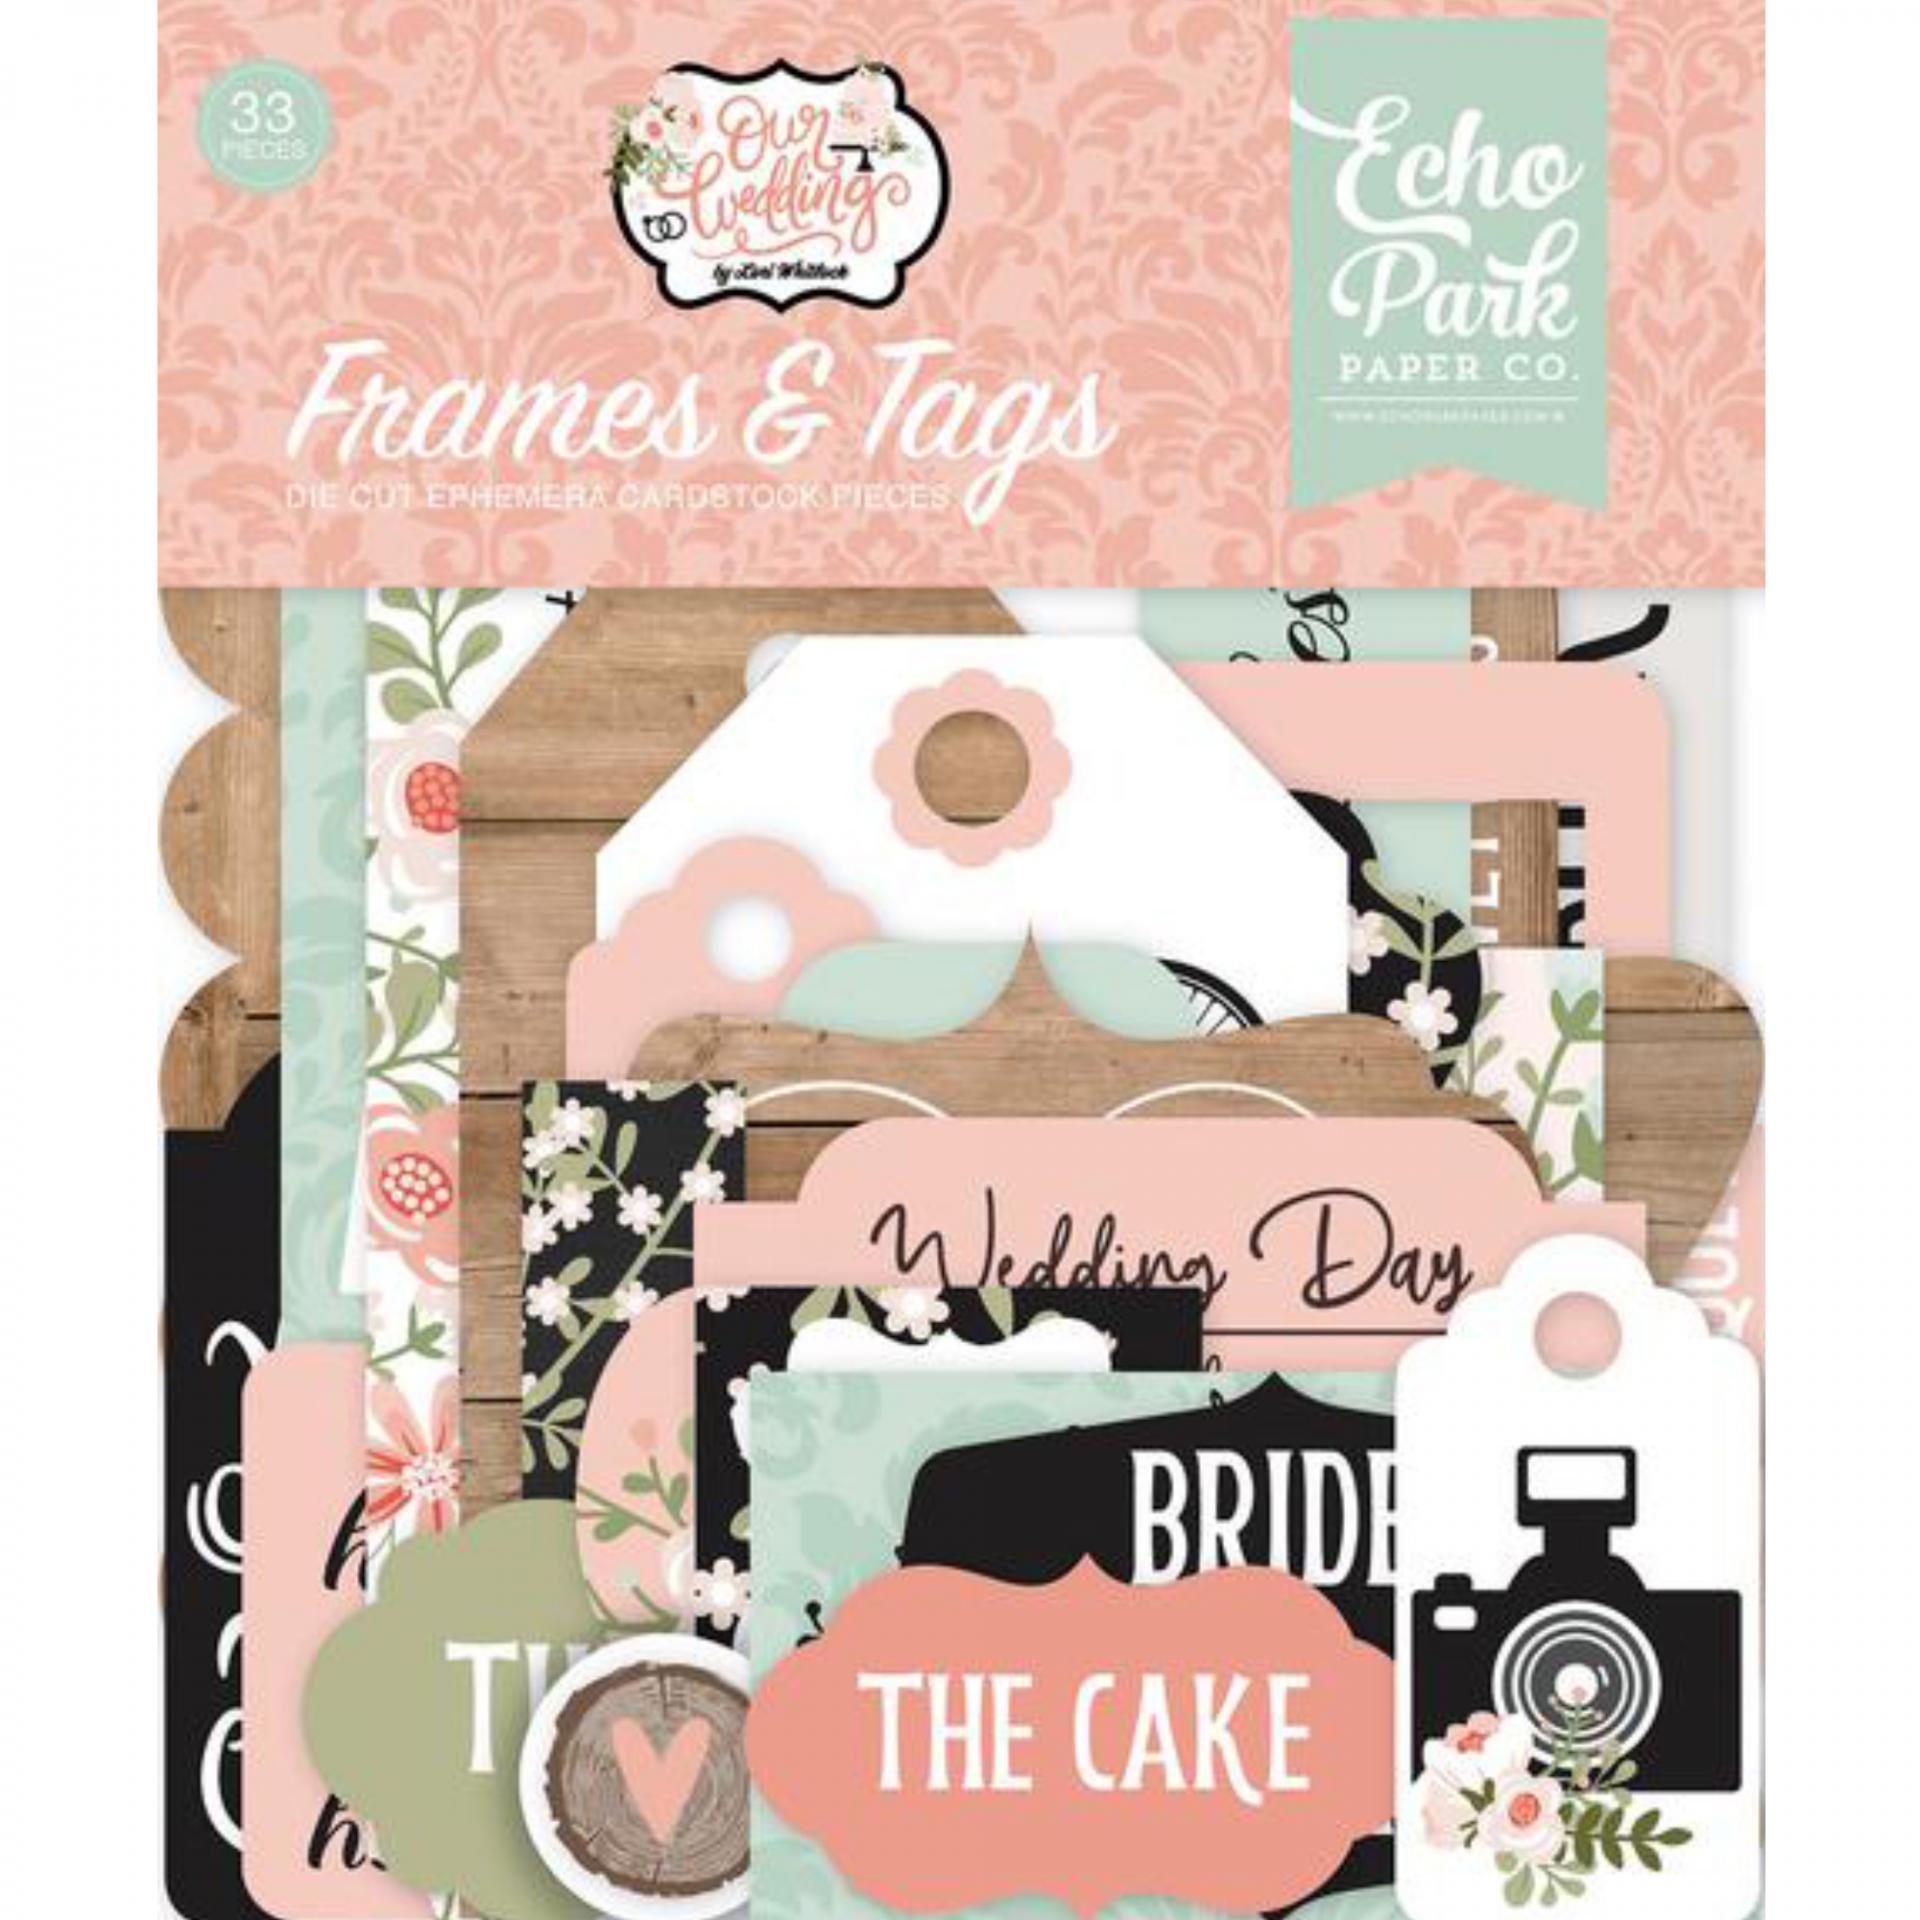 FRAMES & TAGS OUR WEDDING ECHO PARK